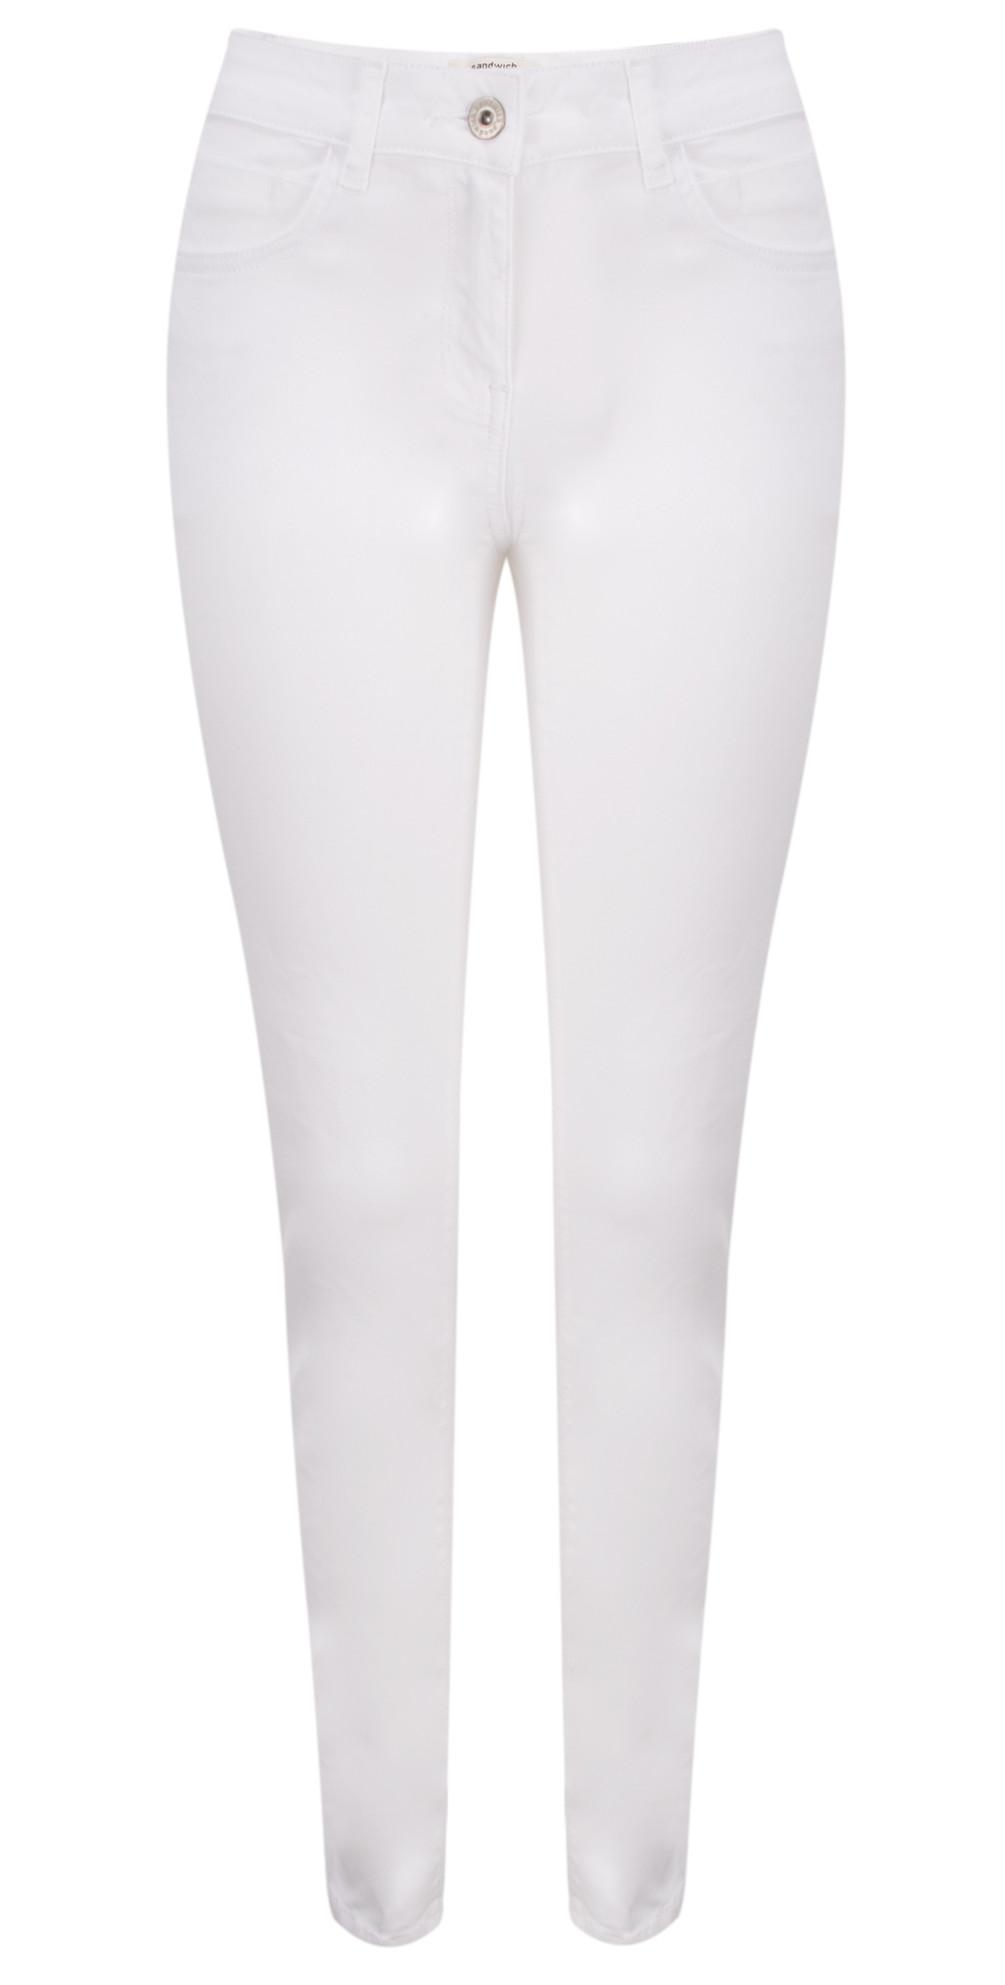 Essential Antic Dye Stretch Skinny Jean main image